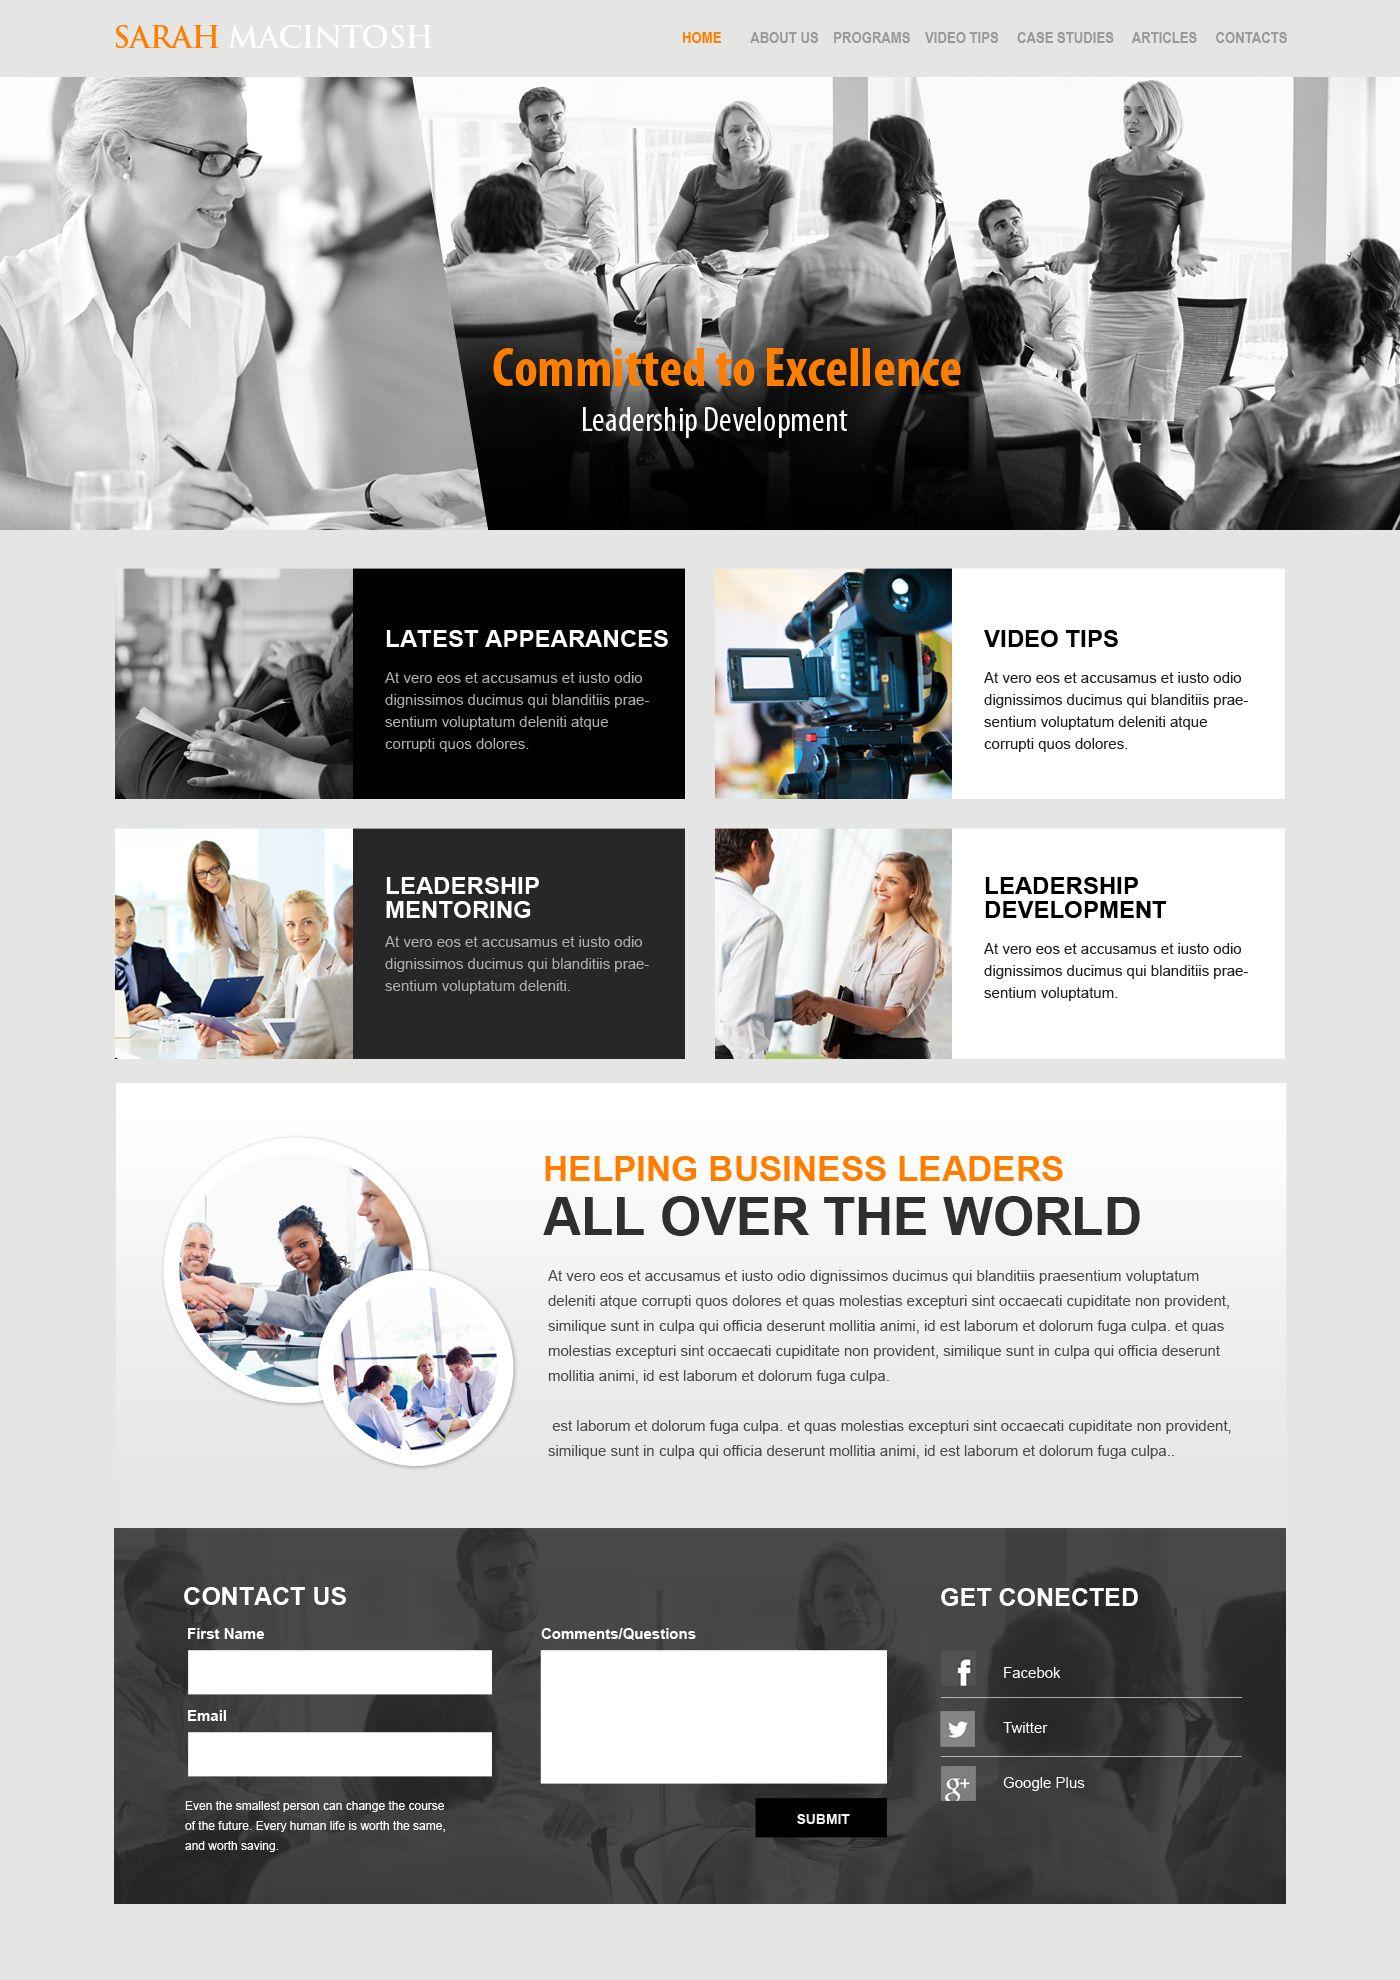 Website Mentor Website Design Marketing Tips Web Development Design Website Design Marketing Website